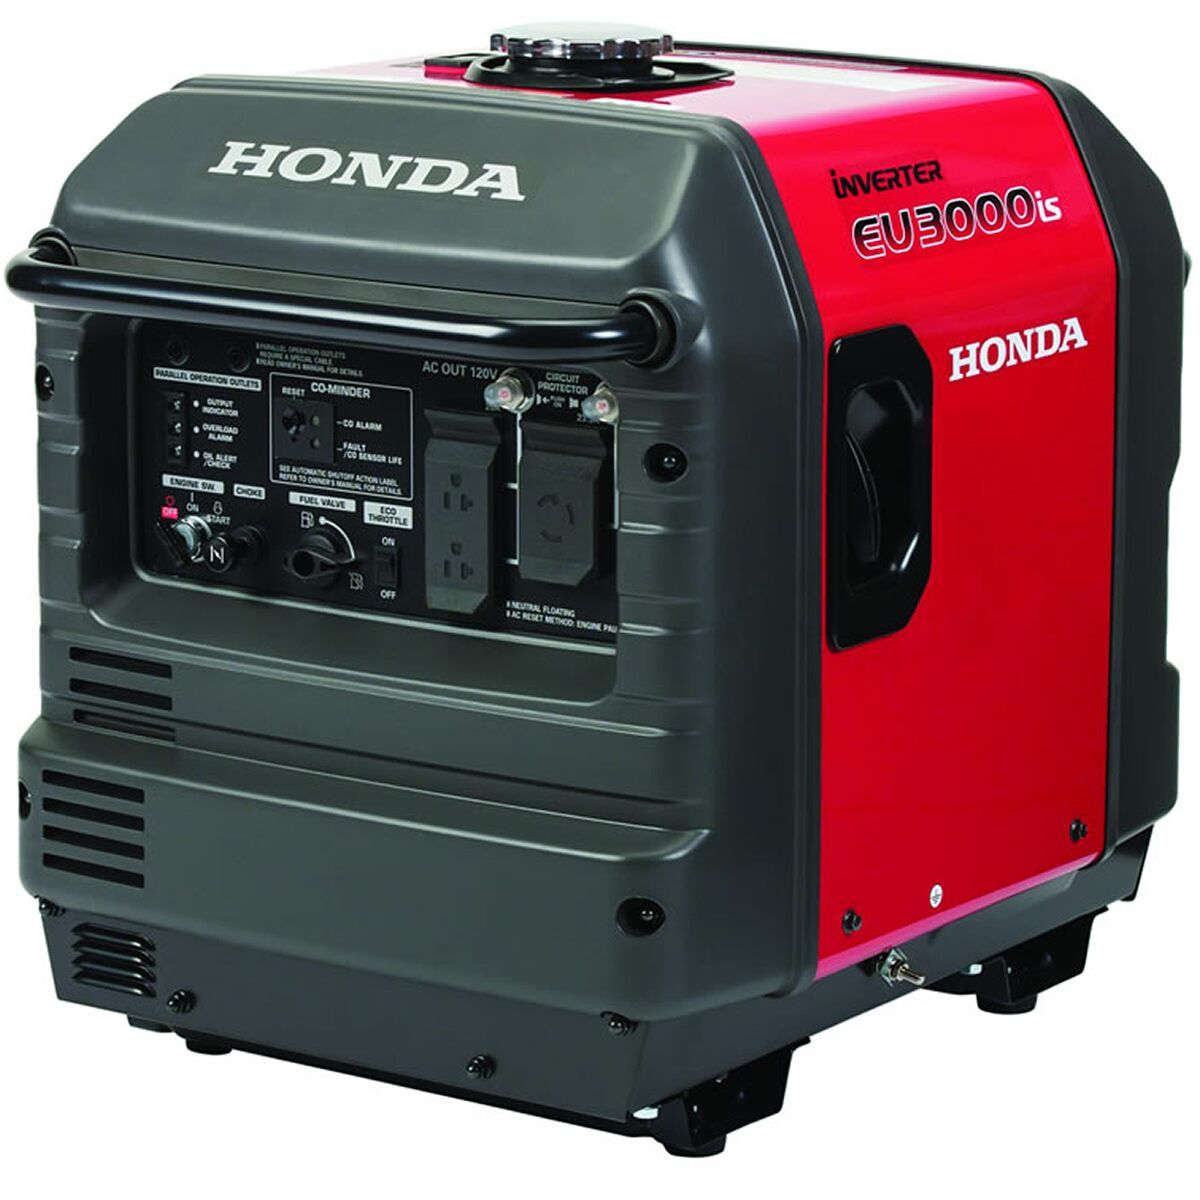 Honda Eu3000isac Eu3000is 2800 Watt Electric Start Portable Inverter Generator W Co Mindera Carb Portable Inverter Generator Gas Powered Generator Honda Generator